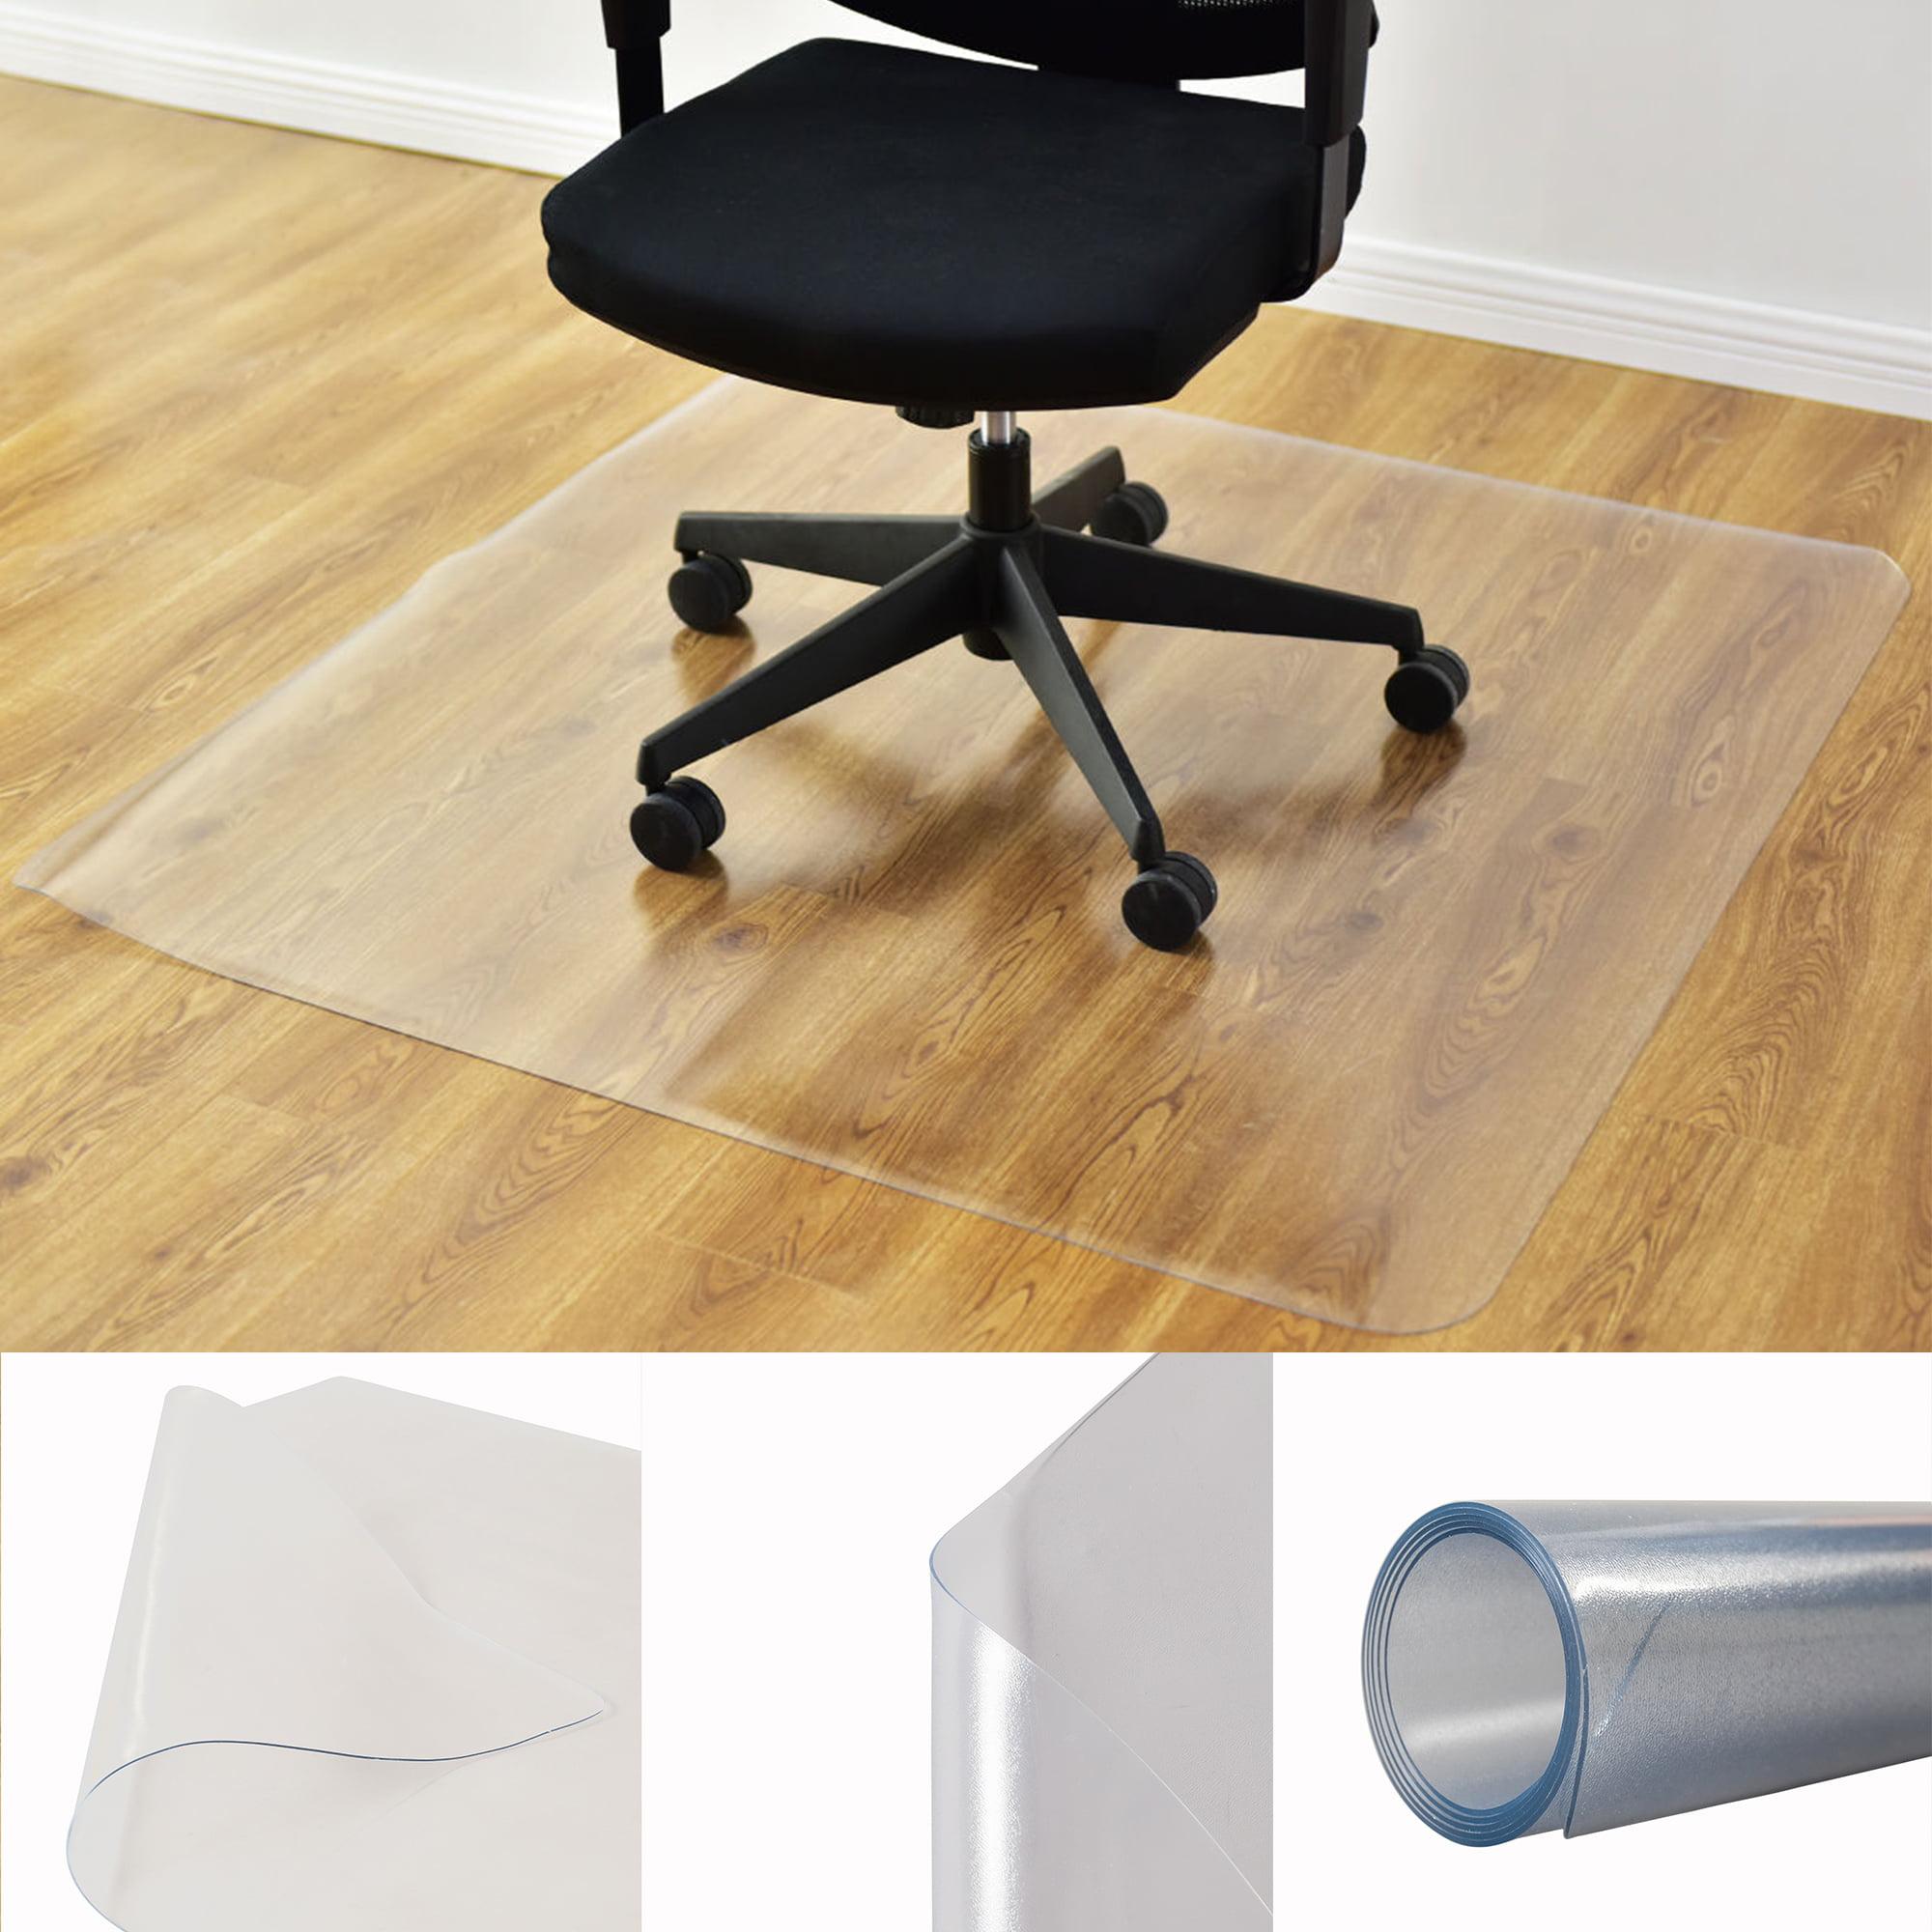 Transpa Office Chair Mats